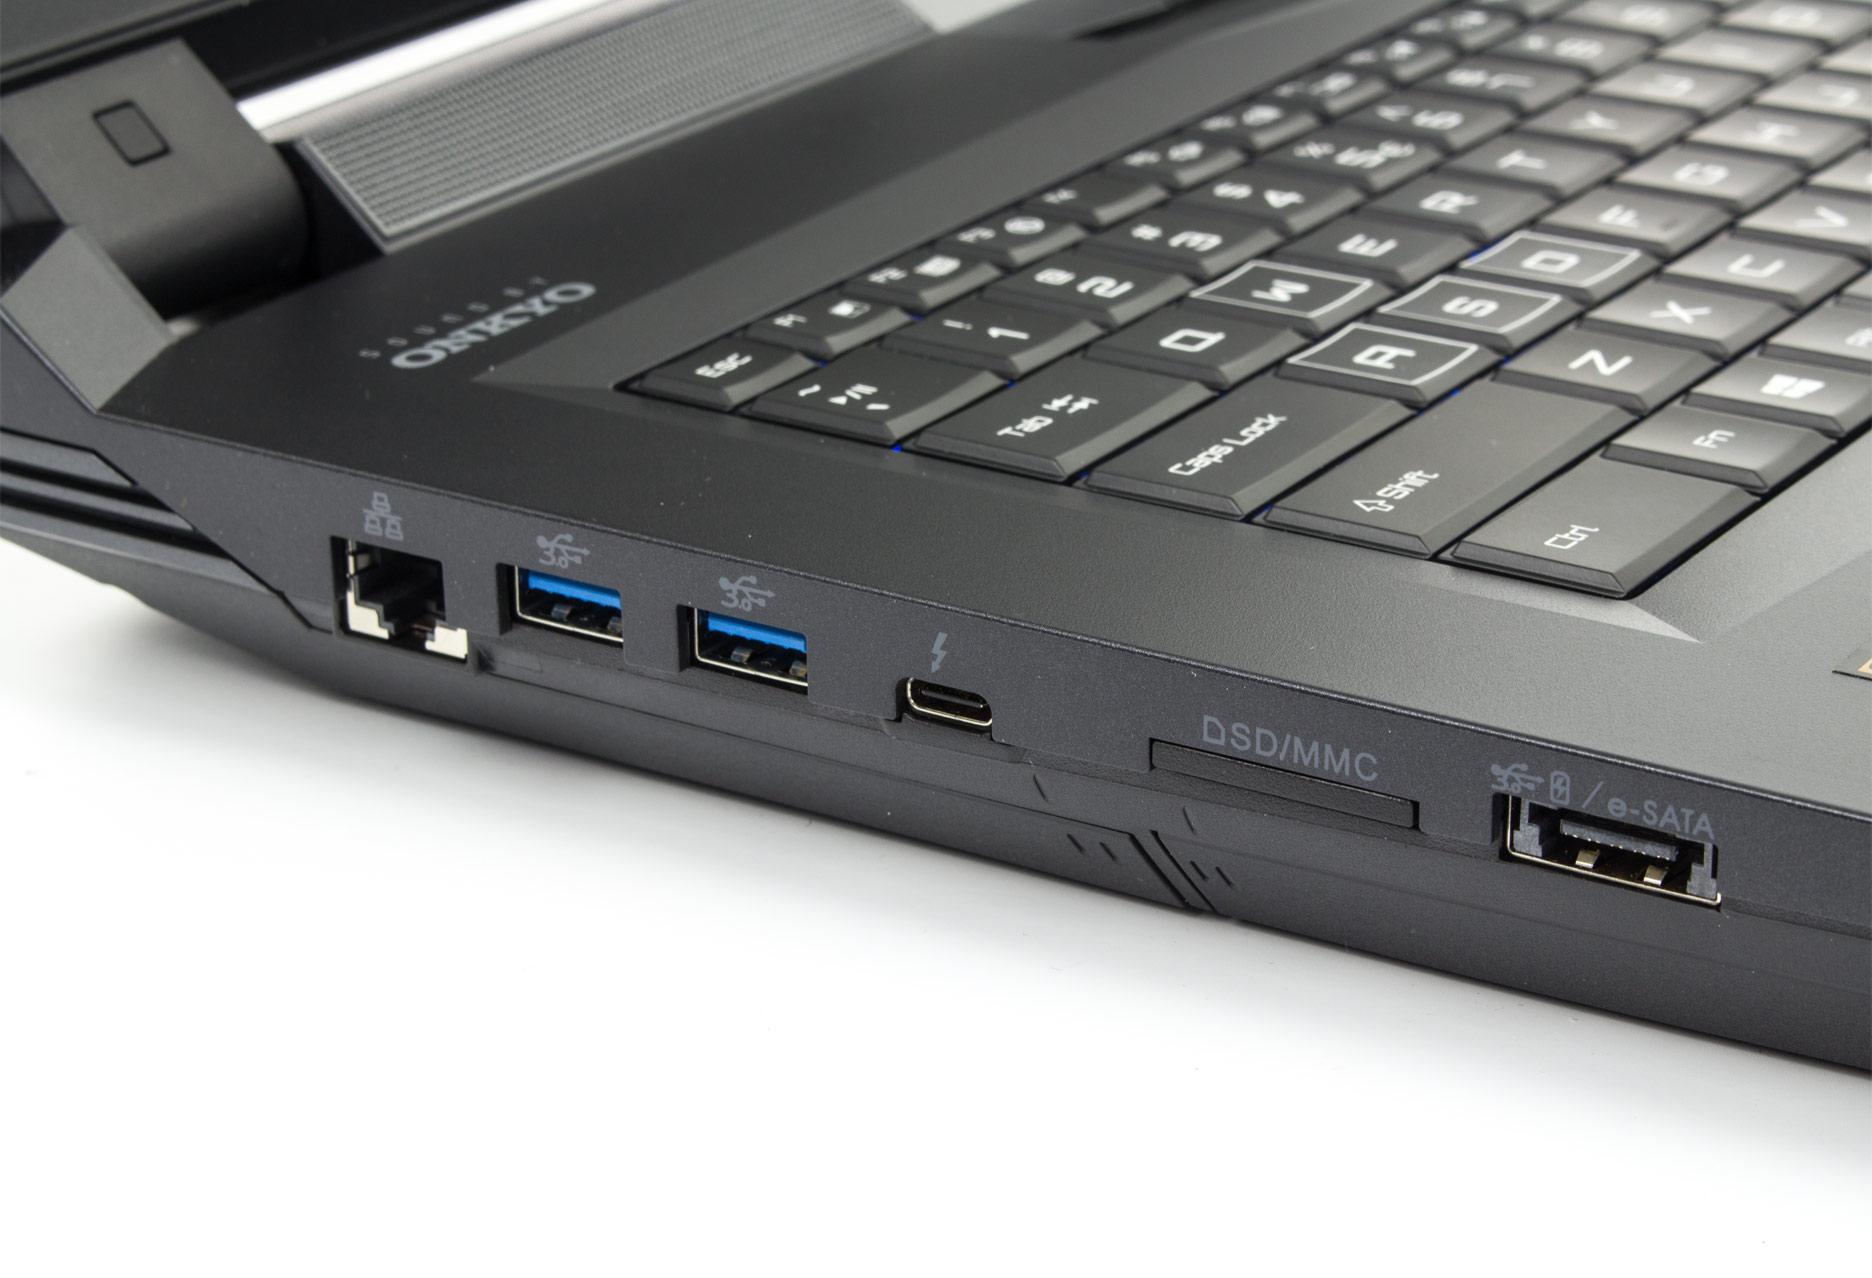 Hyperbook X77DM-G lewy bok